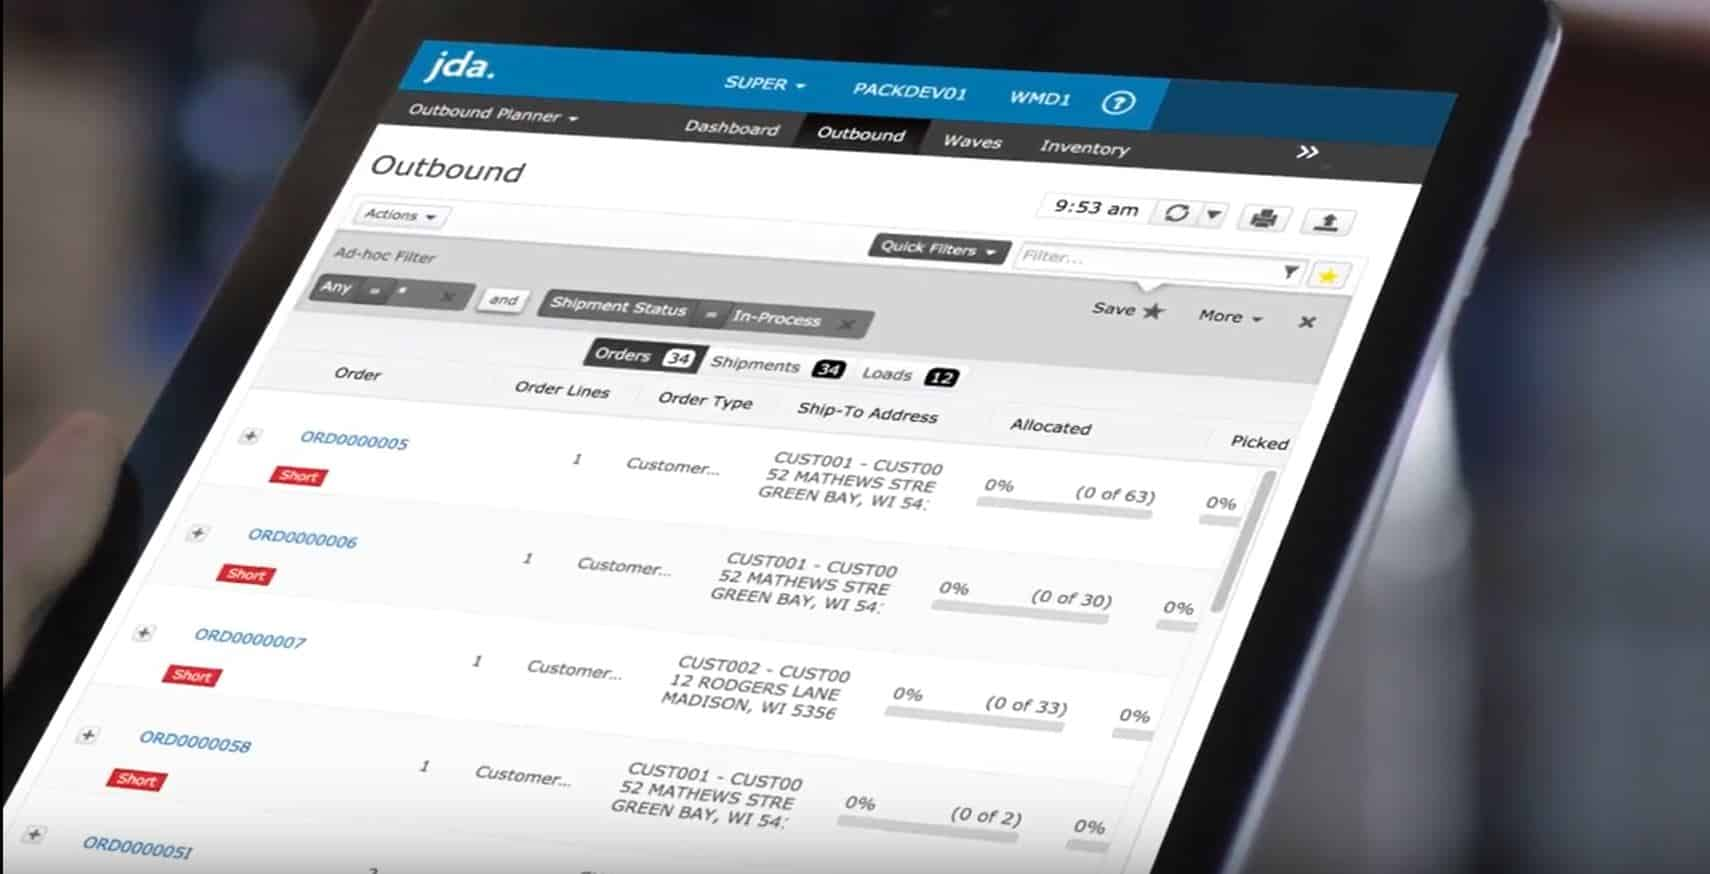 Accelogix Jda Redprairie Warehouse Inventory Management